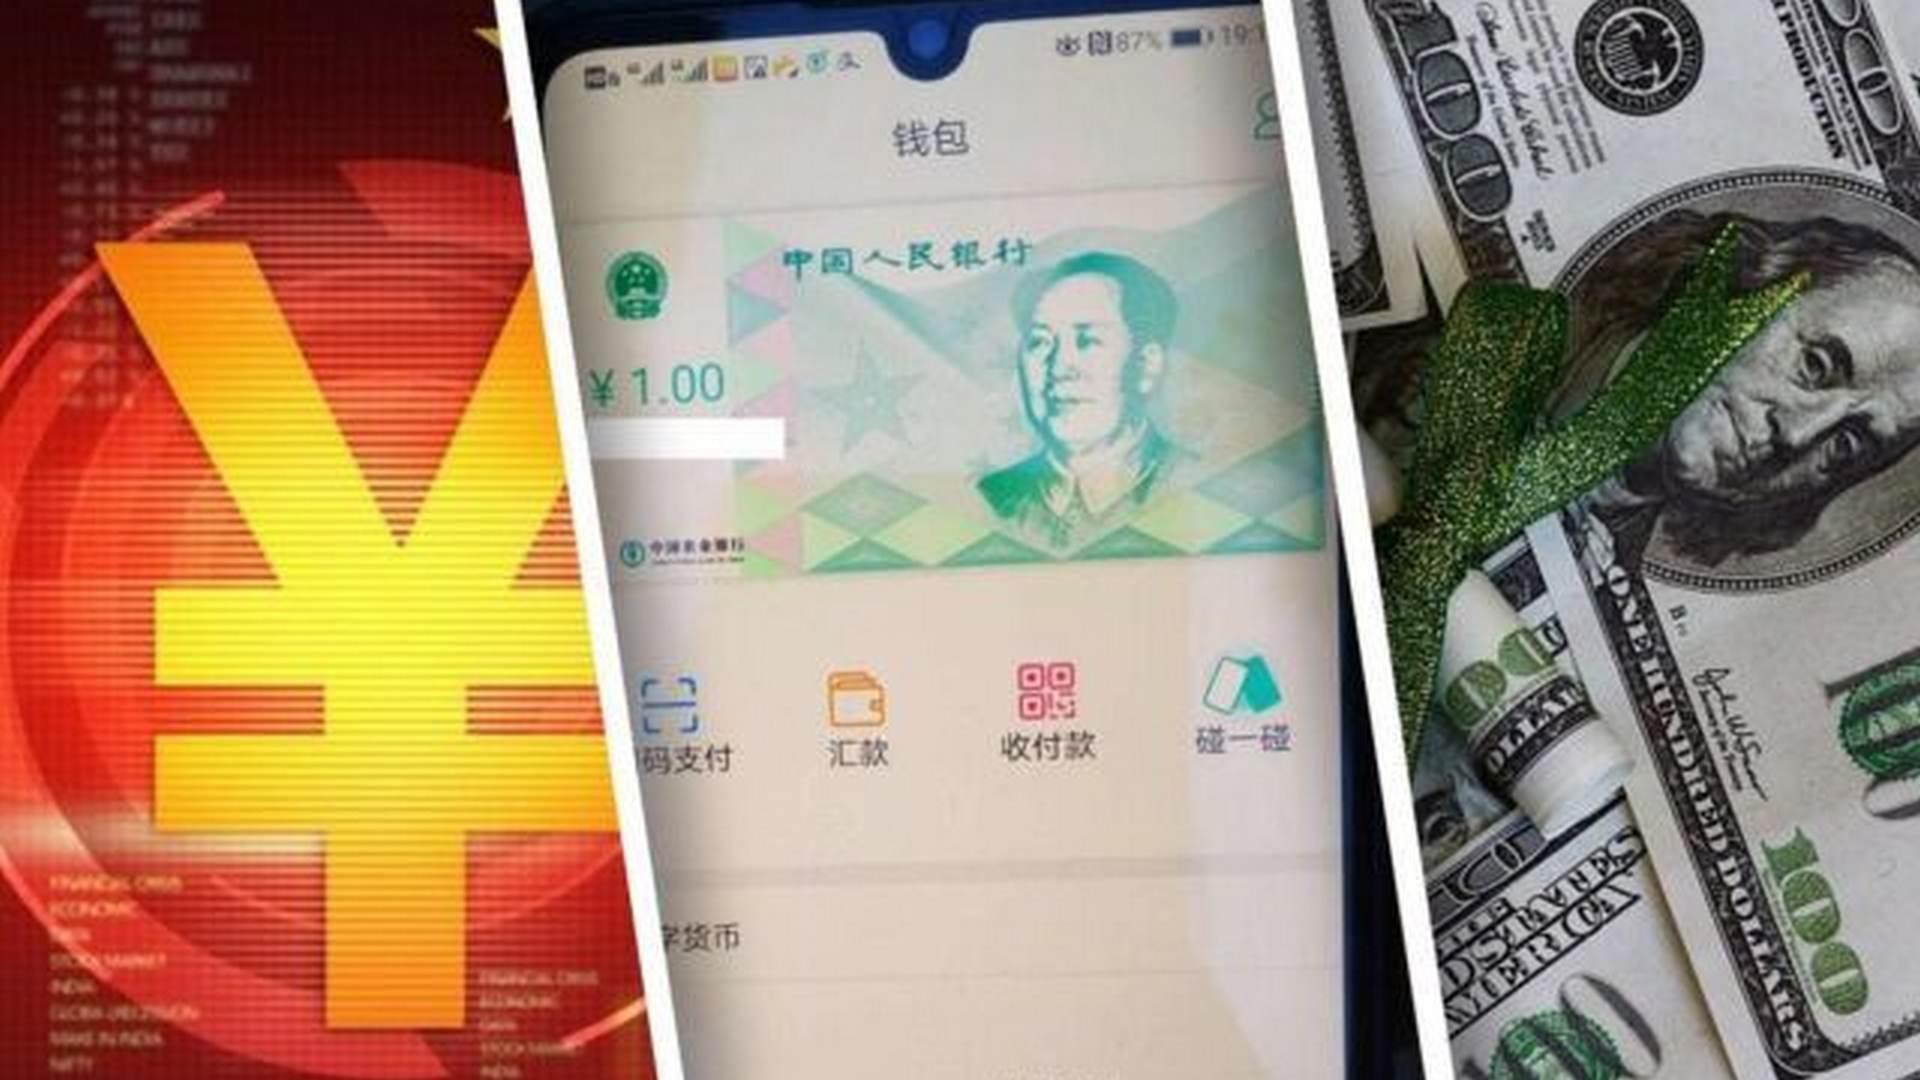 moneta digitale cinese comprare